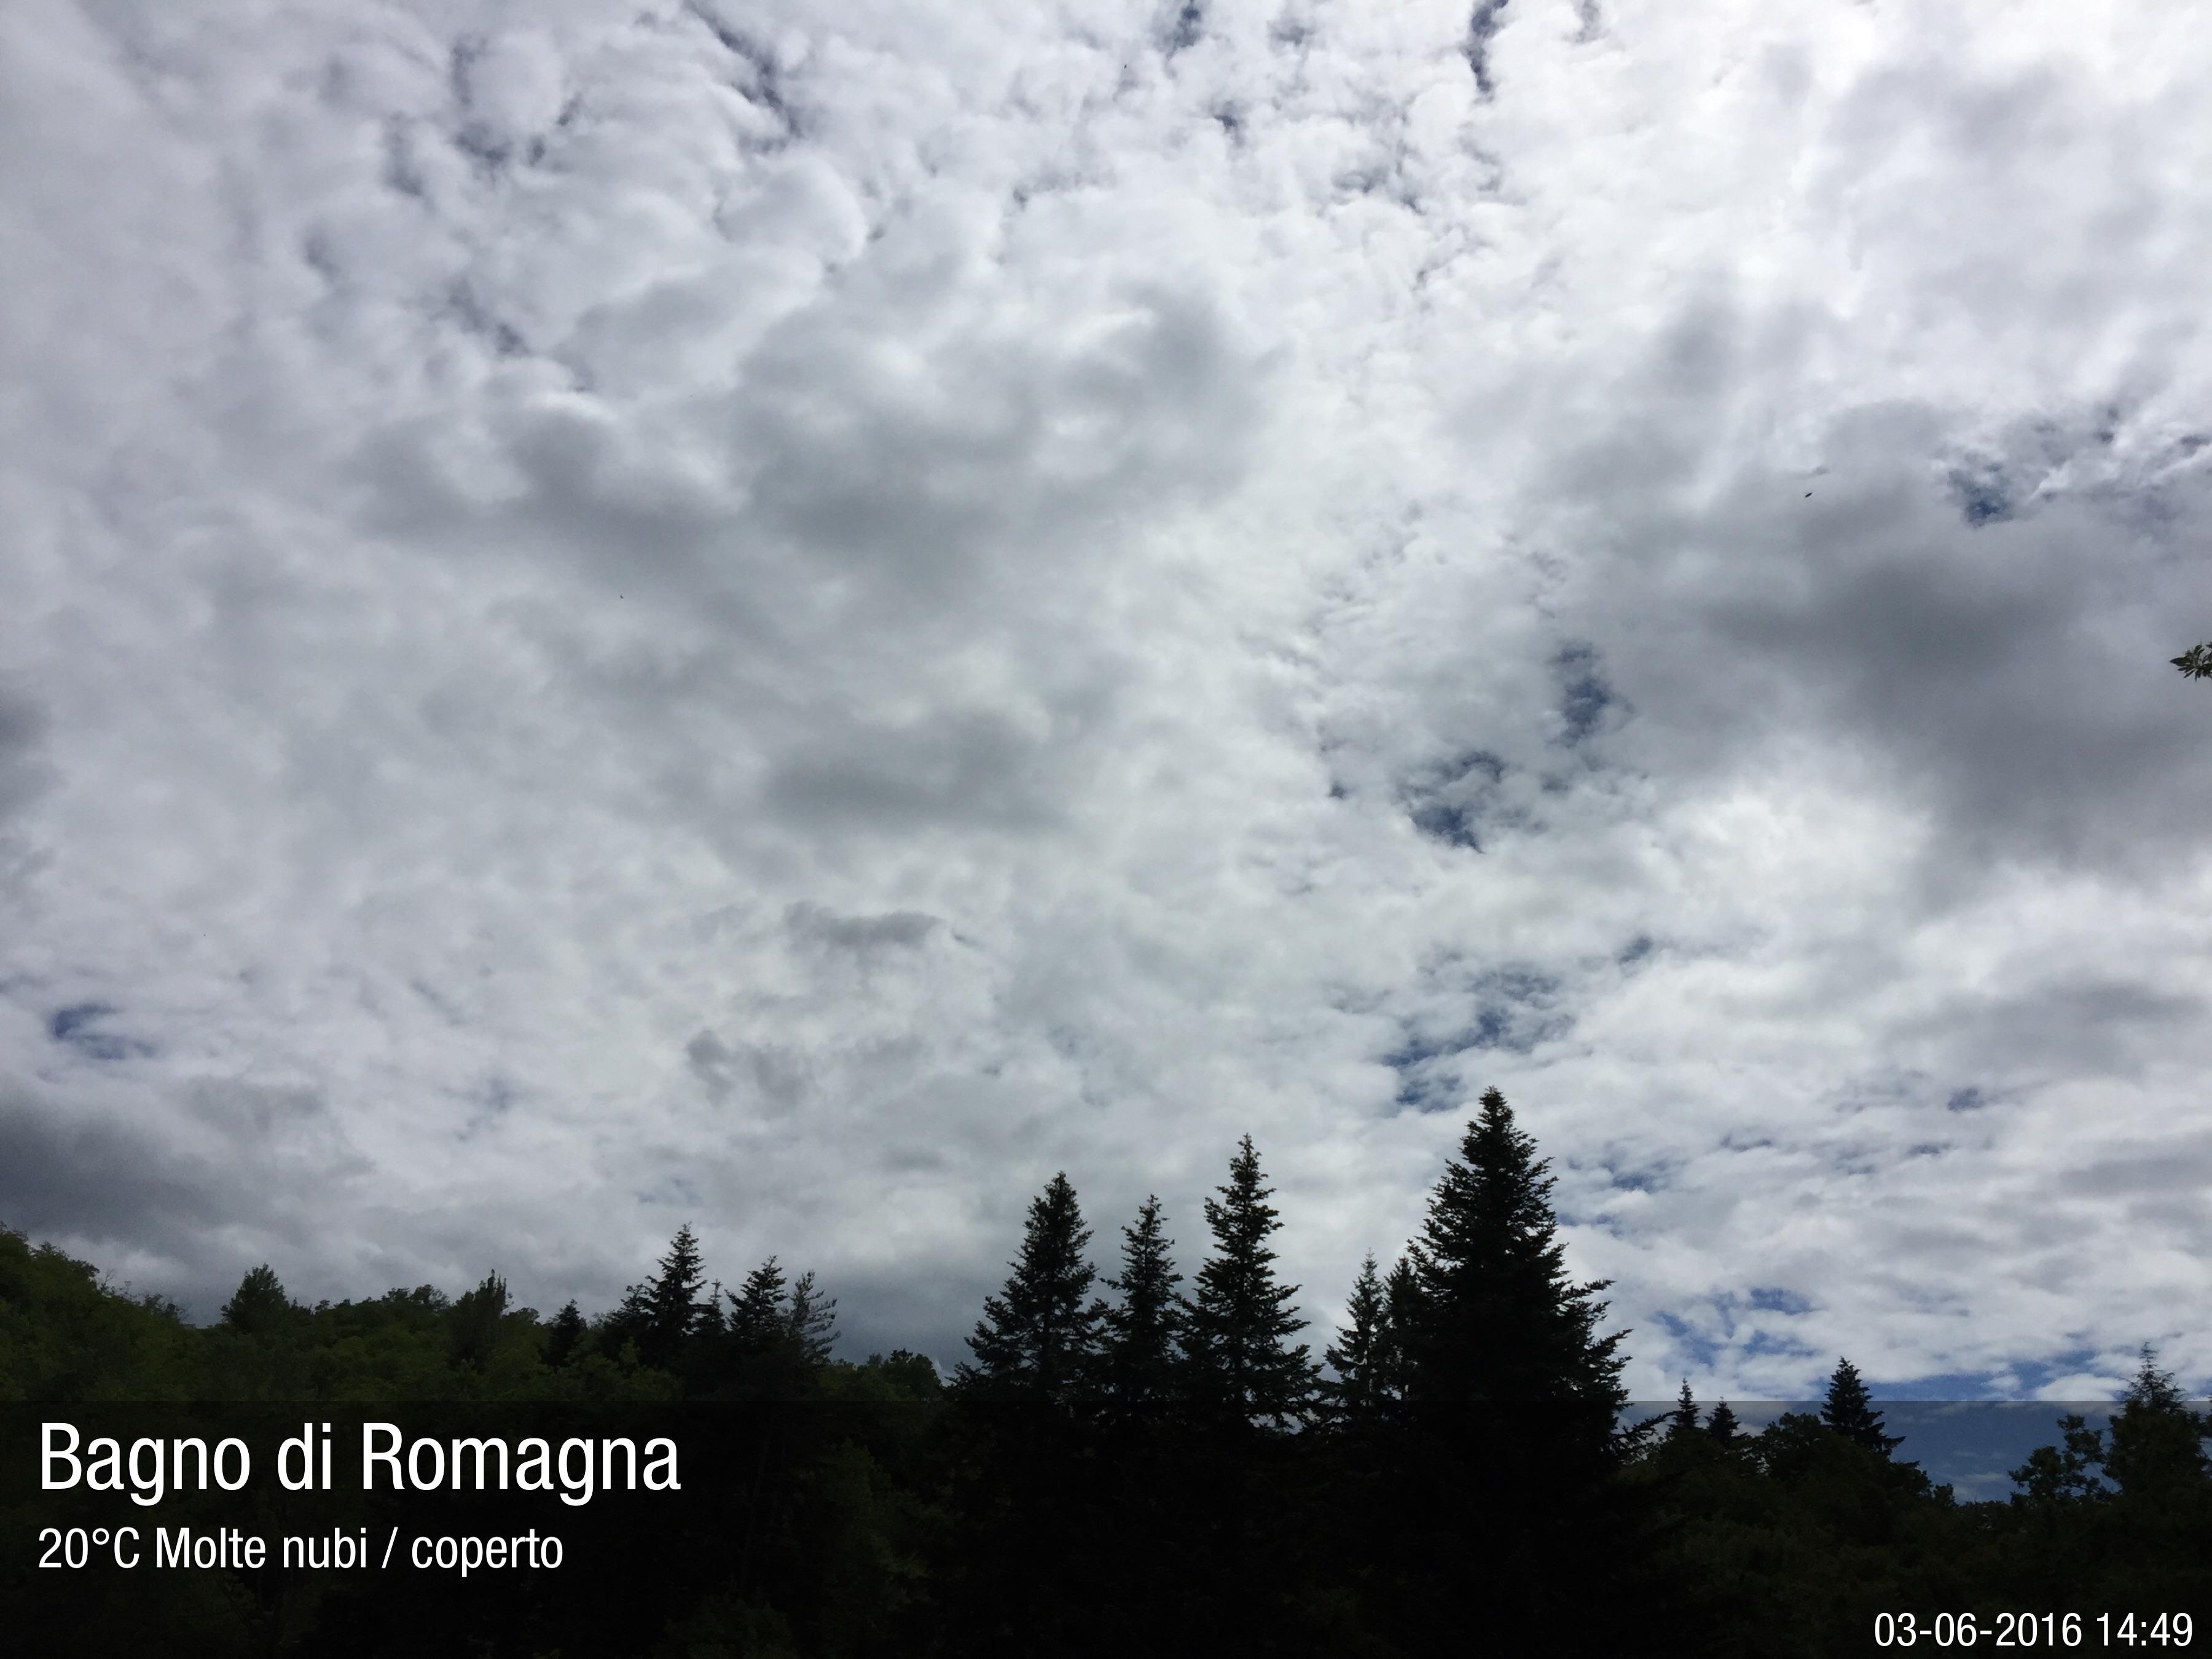 Foto meteo bagno di romagna bagno di romagna ore 14 49 - Meteo it bagno di romagna ...